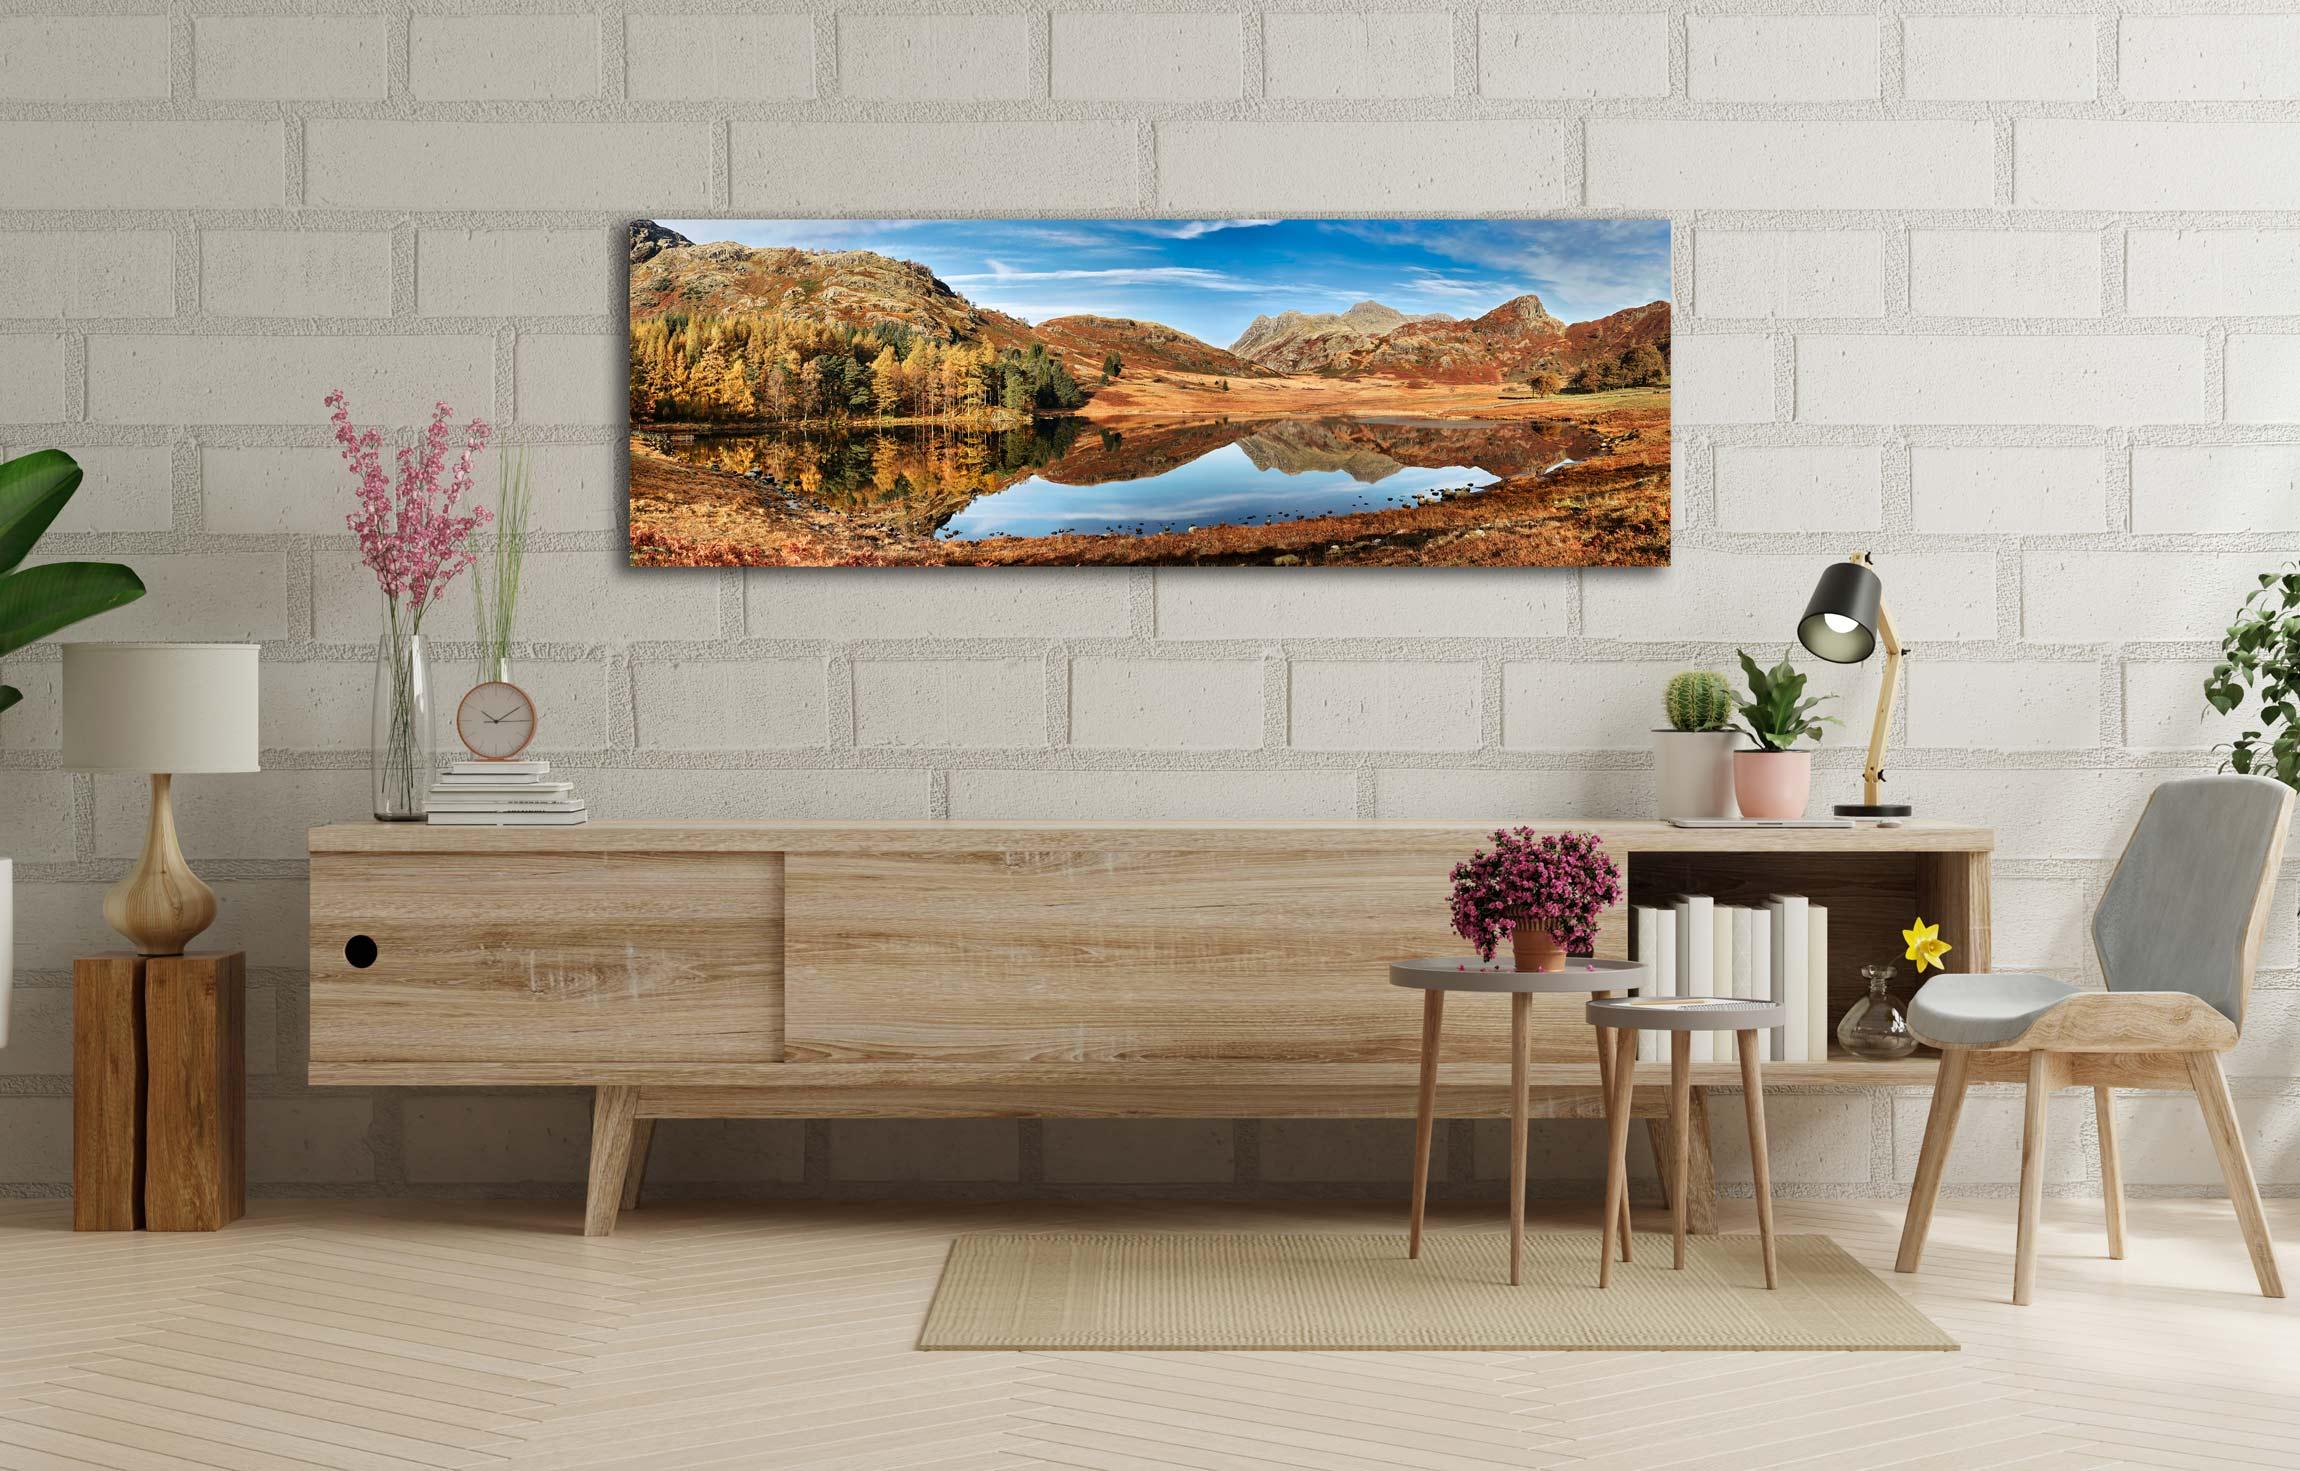 Blea Tarn Autumn Panorama - Lake District Canvas on Wall